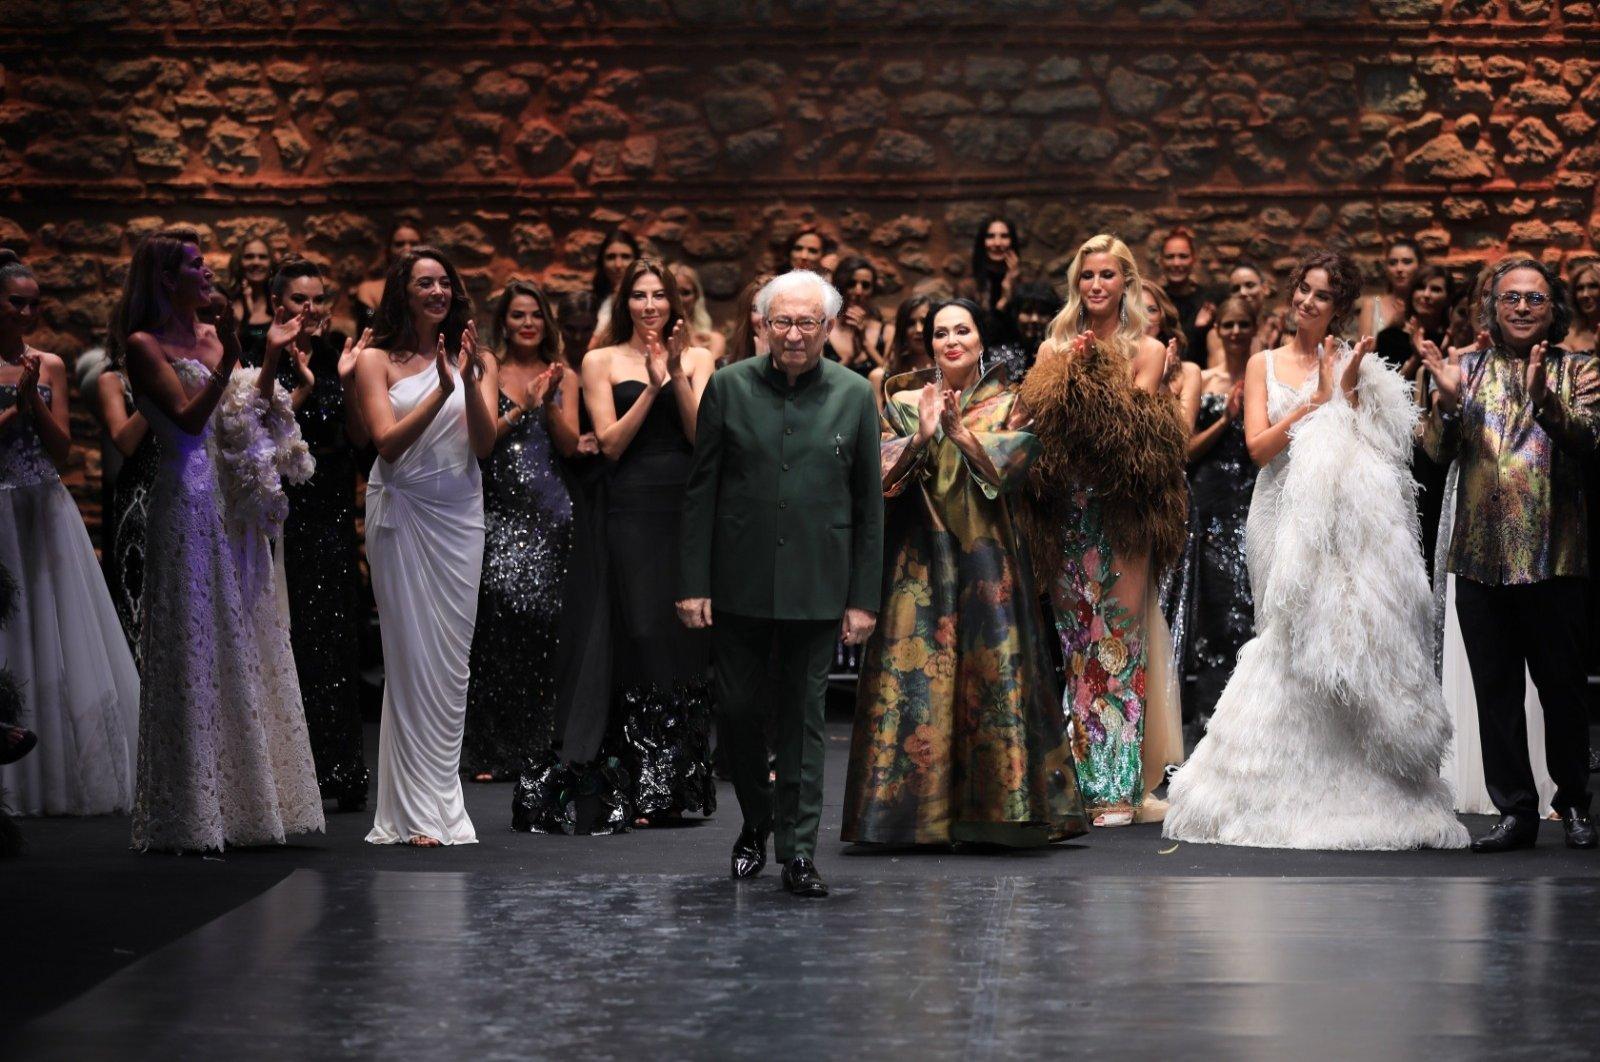 Yıldırım Mayruk (C) receives applause during his last fashion show in Istanbul, Turkey, Sept. 24, 2020. (DHA Photo)